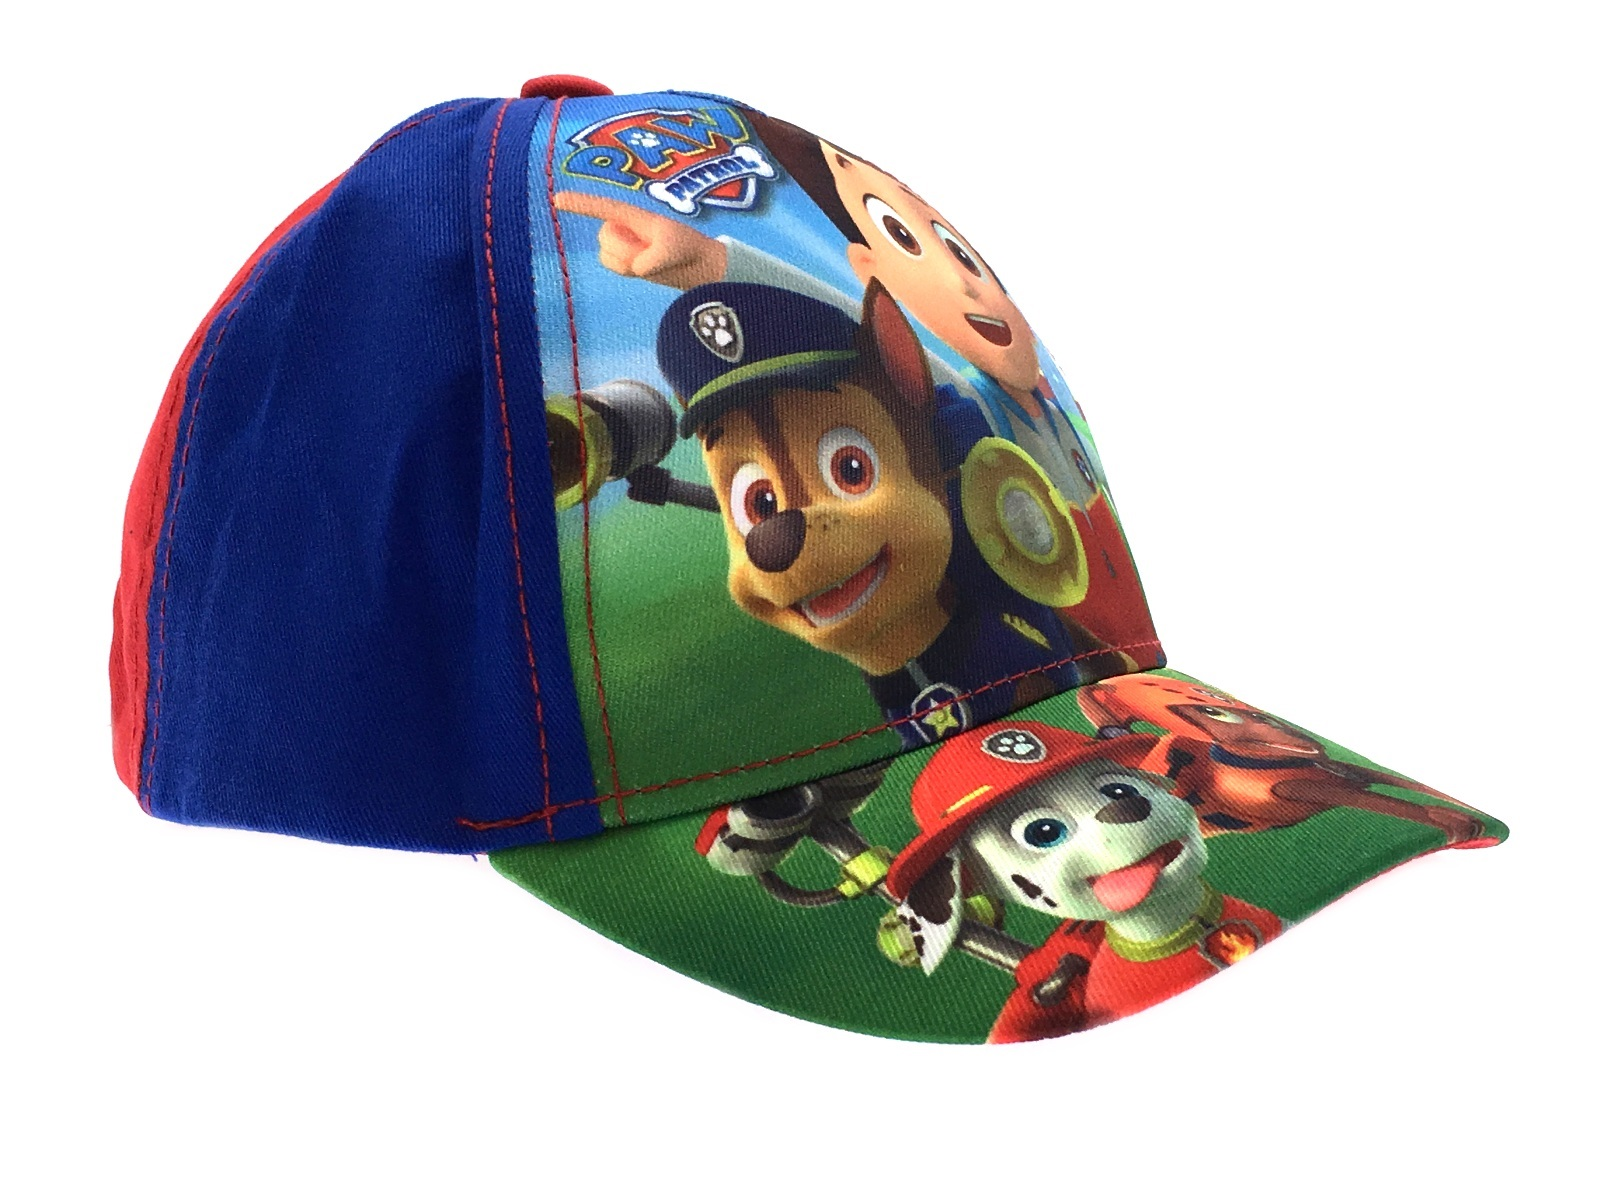 kids character baseball cap adjustable peaked summer hat